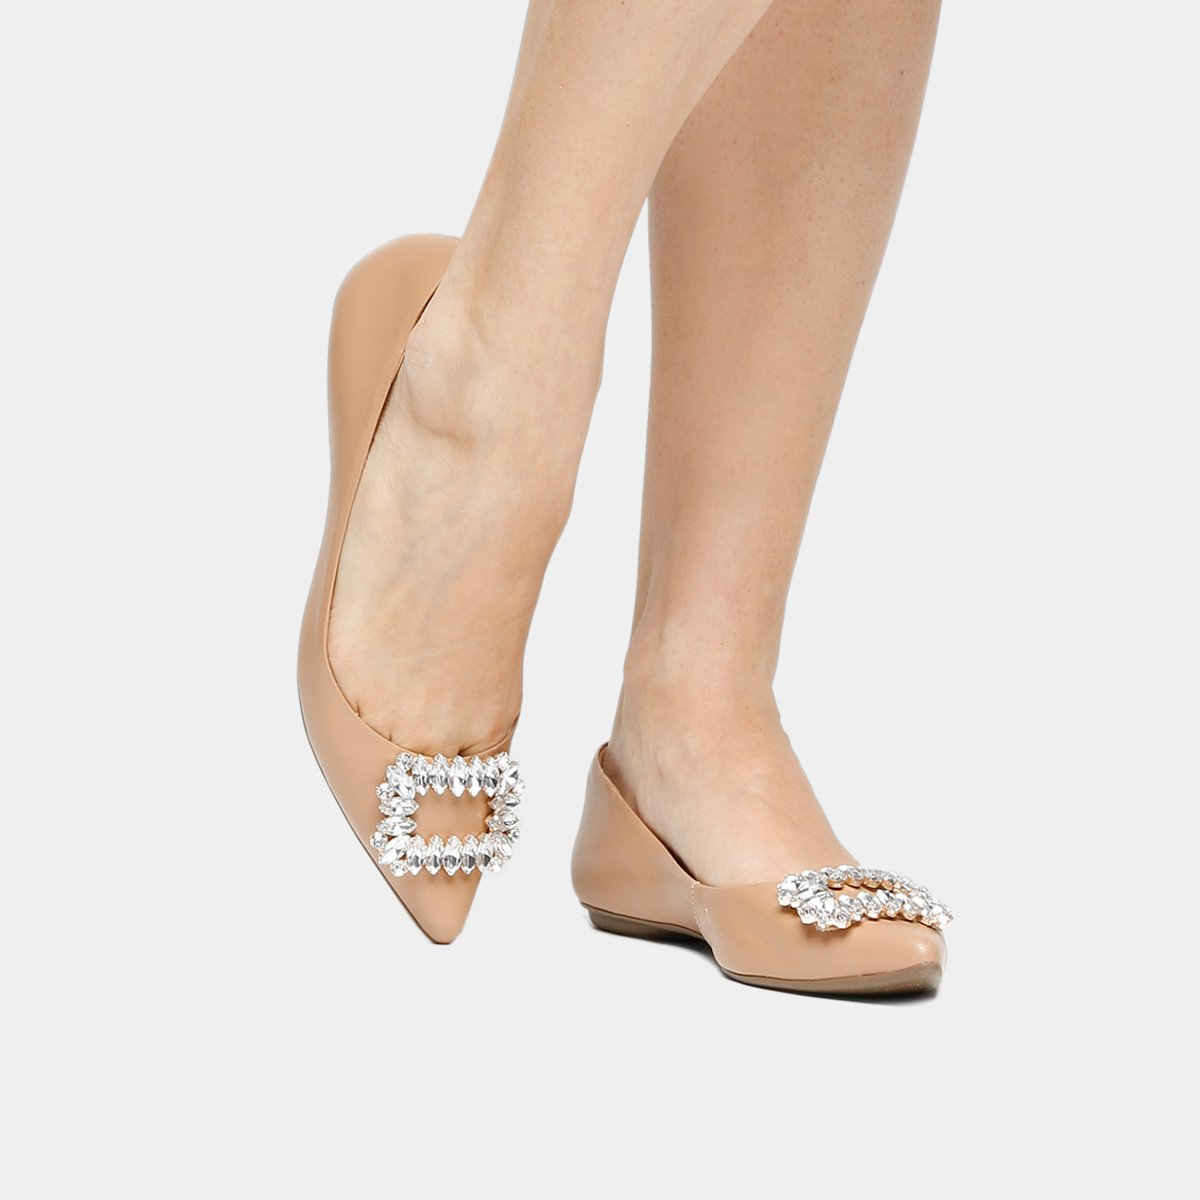 1b87c52cfc Sapatilha Couro Shoestock Bico Fino Fivela Pedrarias Feminina - Nude ...